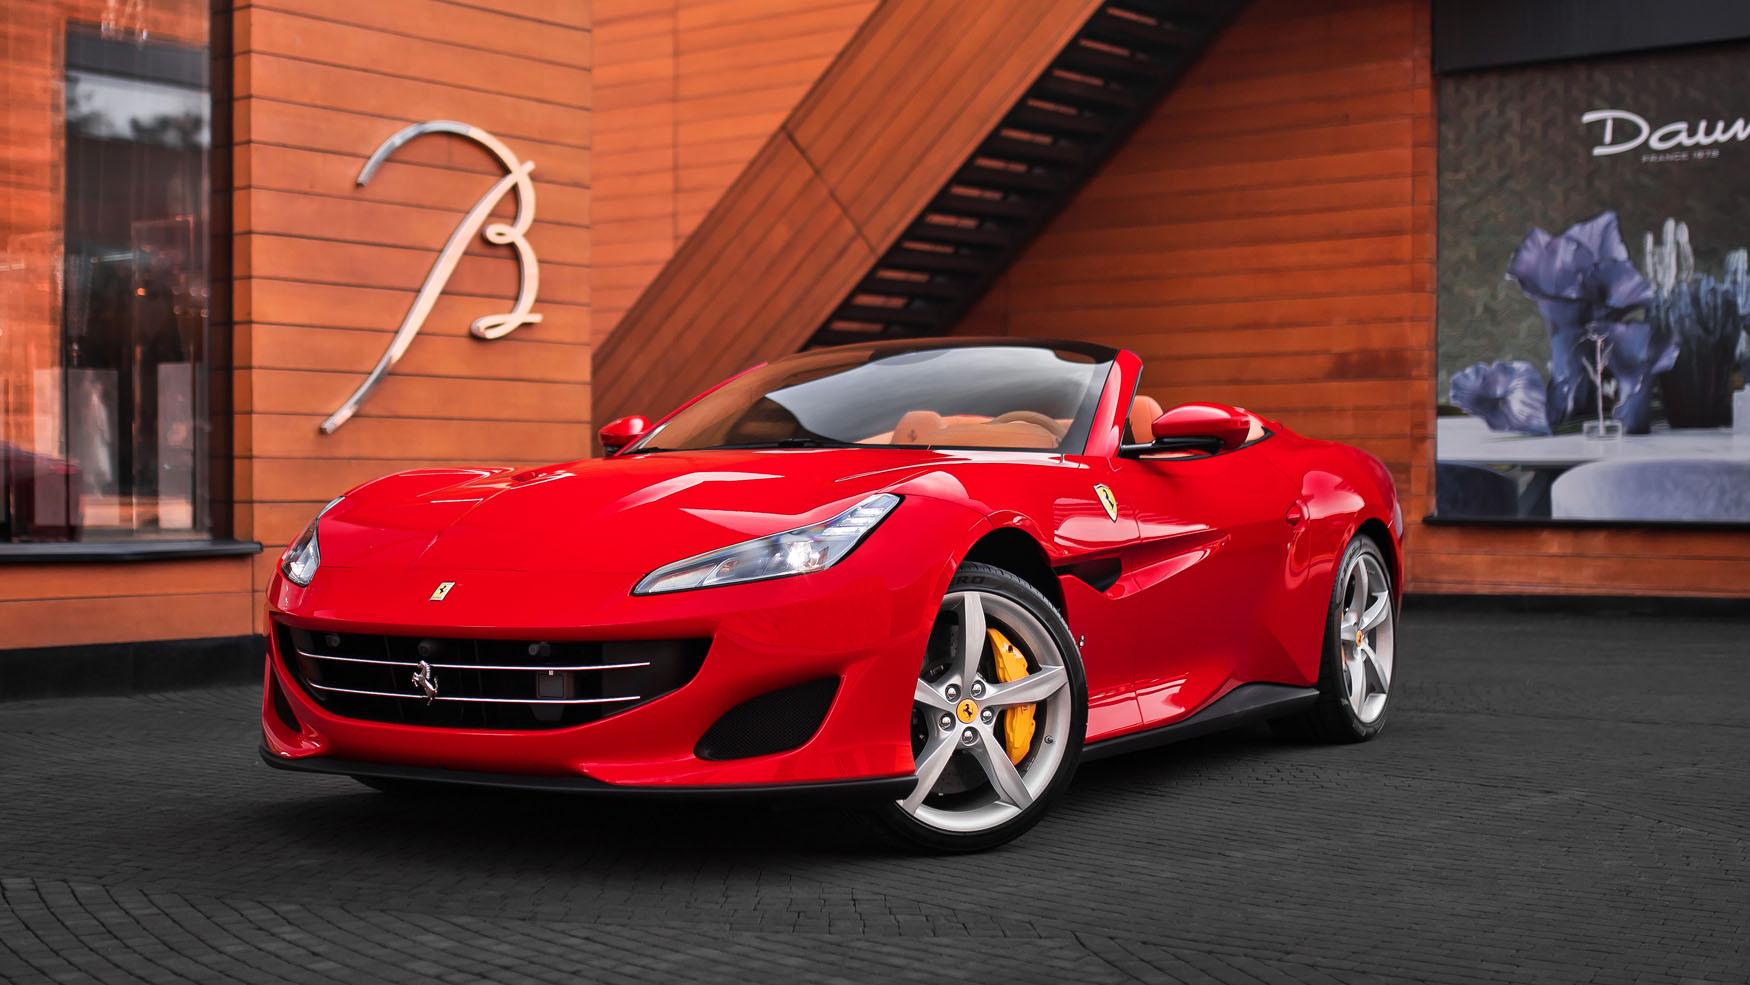 PORTOFINO // BLU CORSA METALLIC - изображение 1 на Ferrarimoscow.ru!